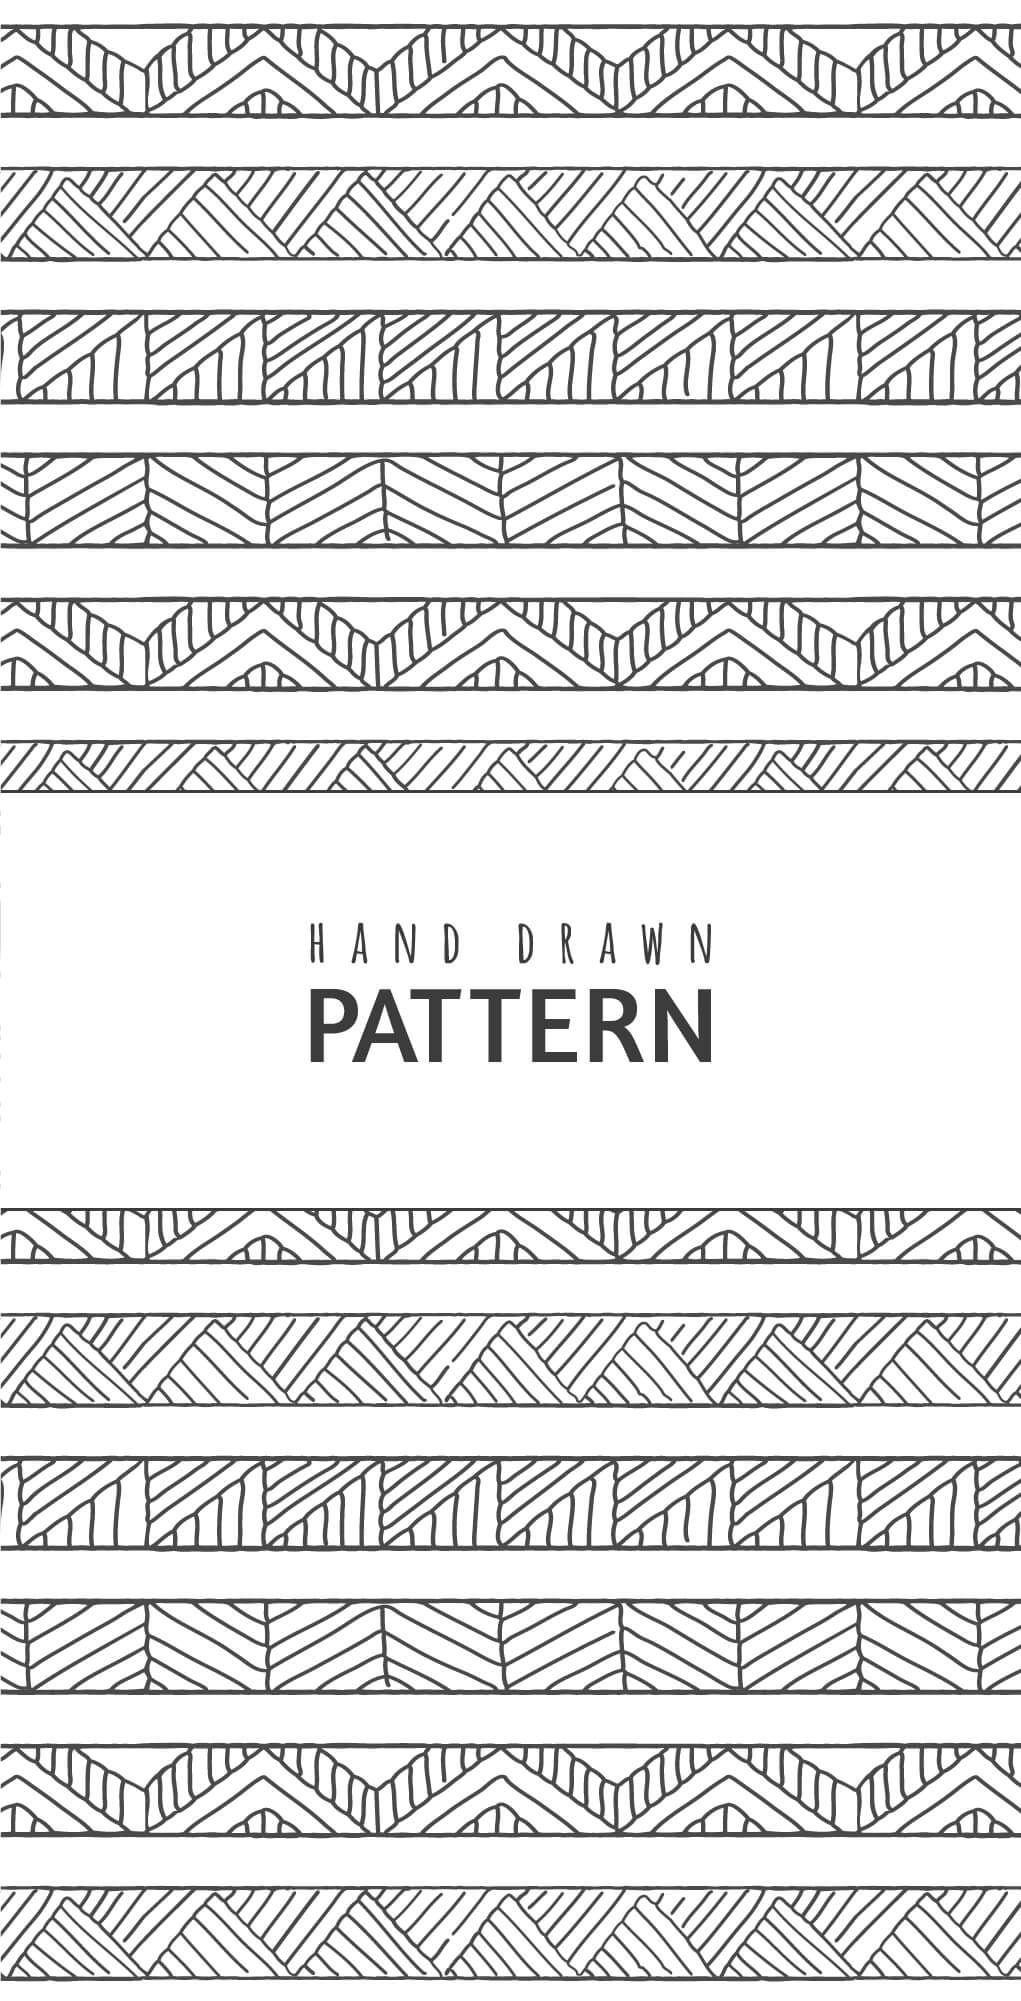 Pattern Brushes for Adobe Illustrator  Pattern Brushes for Adobe Illustrator  #Adobe #Brushes #illustrator #pattern